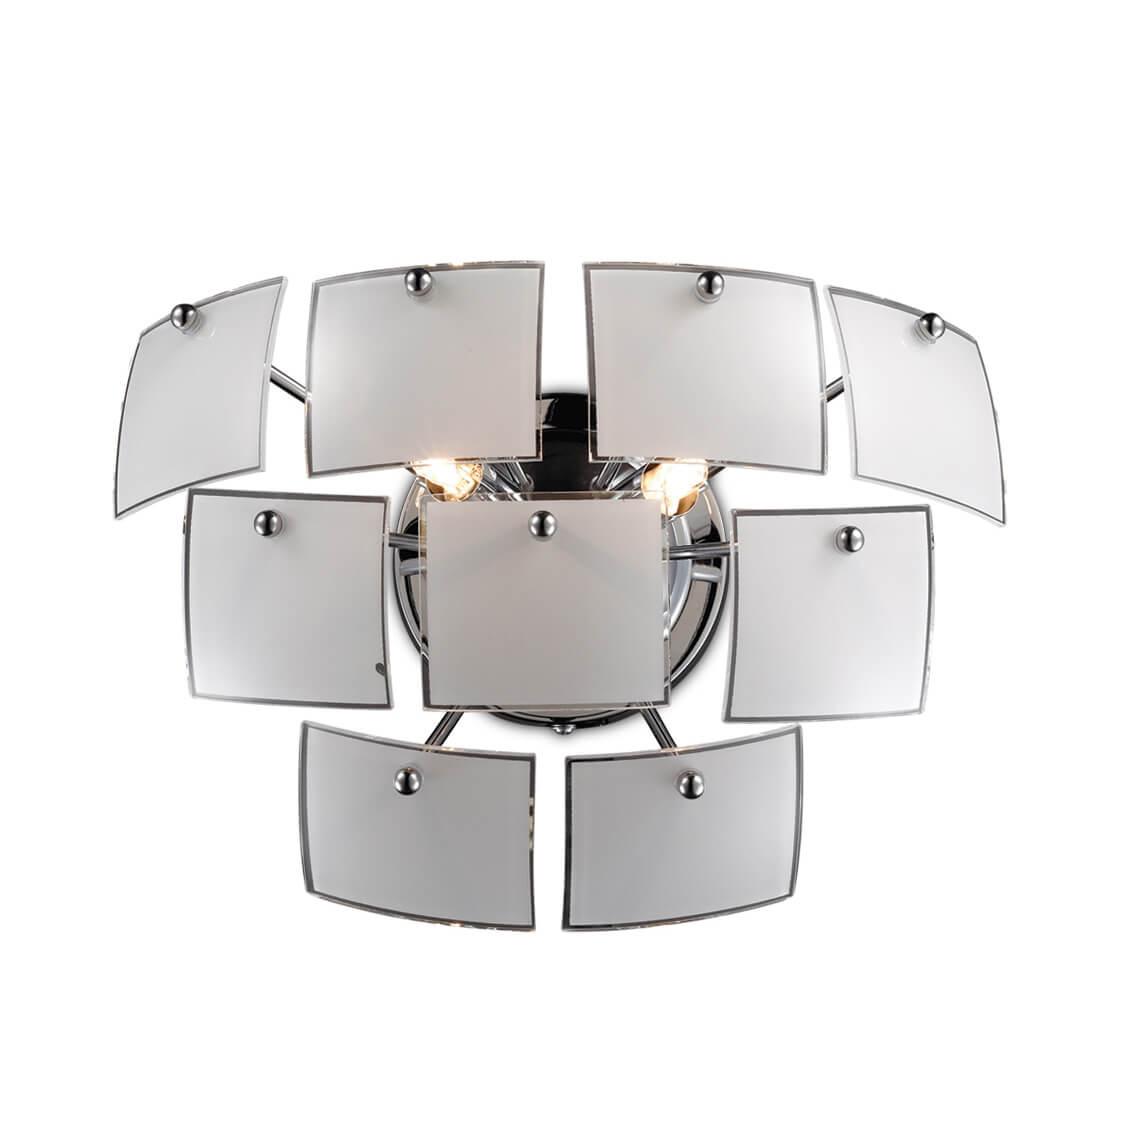 Бра Odeon Light Vorm 2655/2W odeon light настольная лампа декоративная odeon light vorm 2655 2t